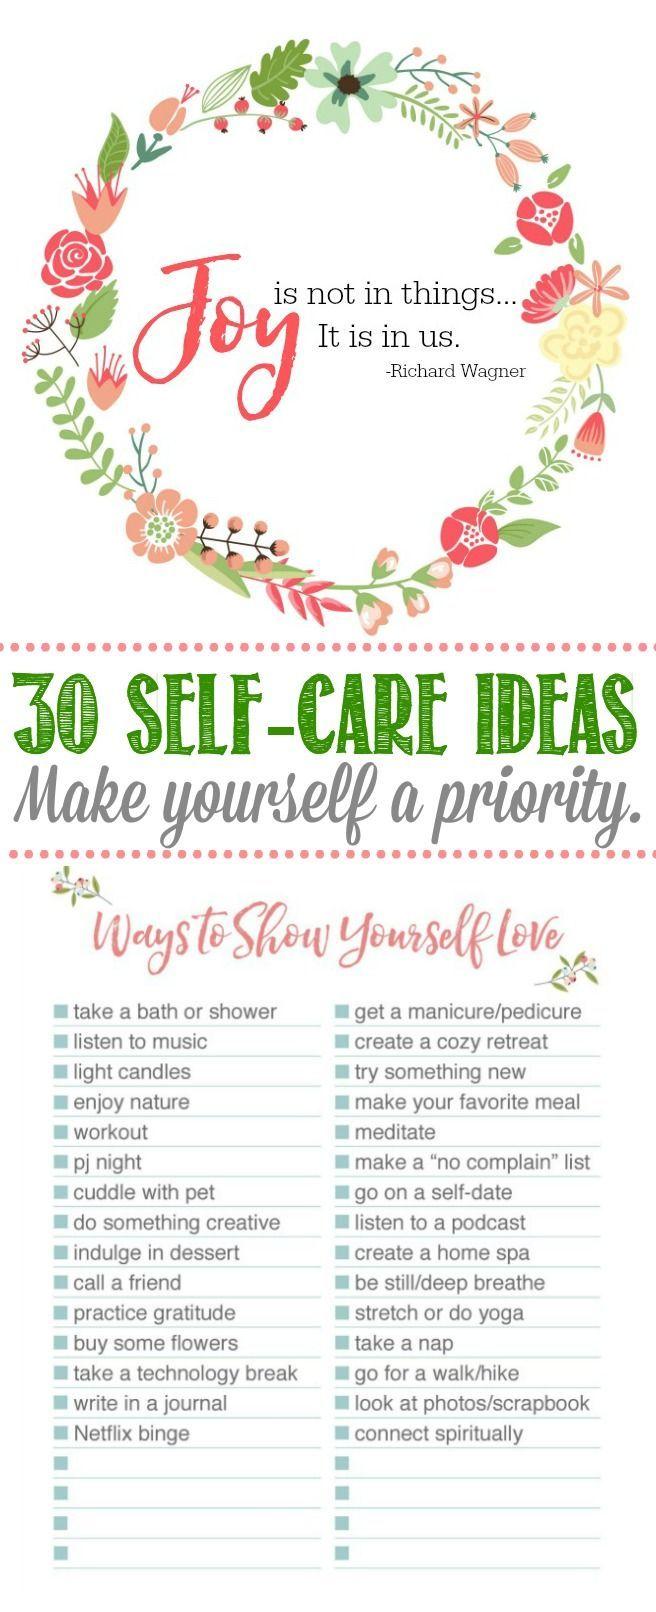 Self-Care IdeasPine Cones and Acorns Blog